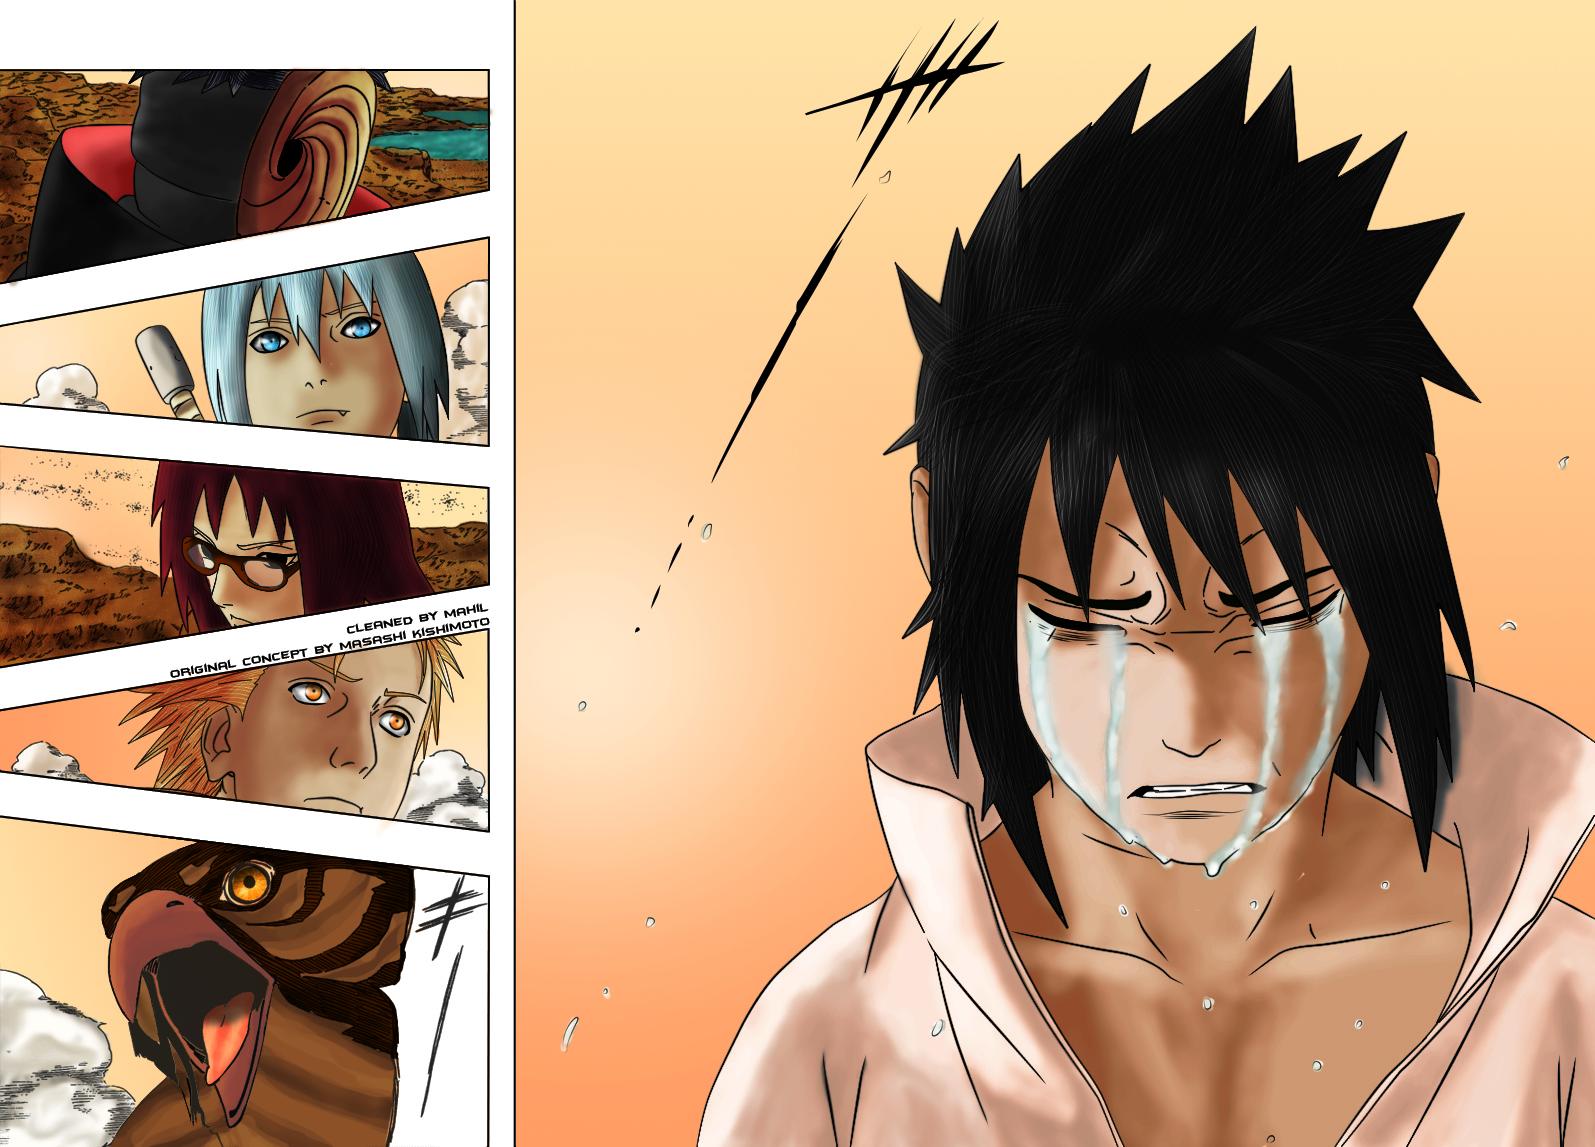 Sasuke_Cry_by_Sinist3r_Depht